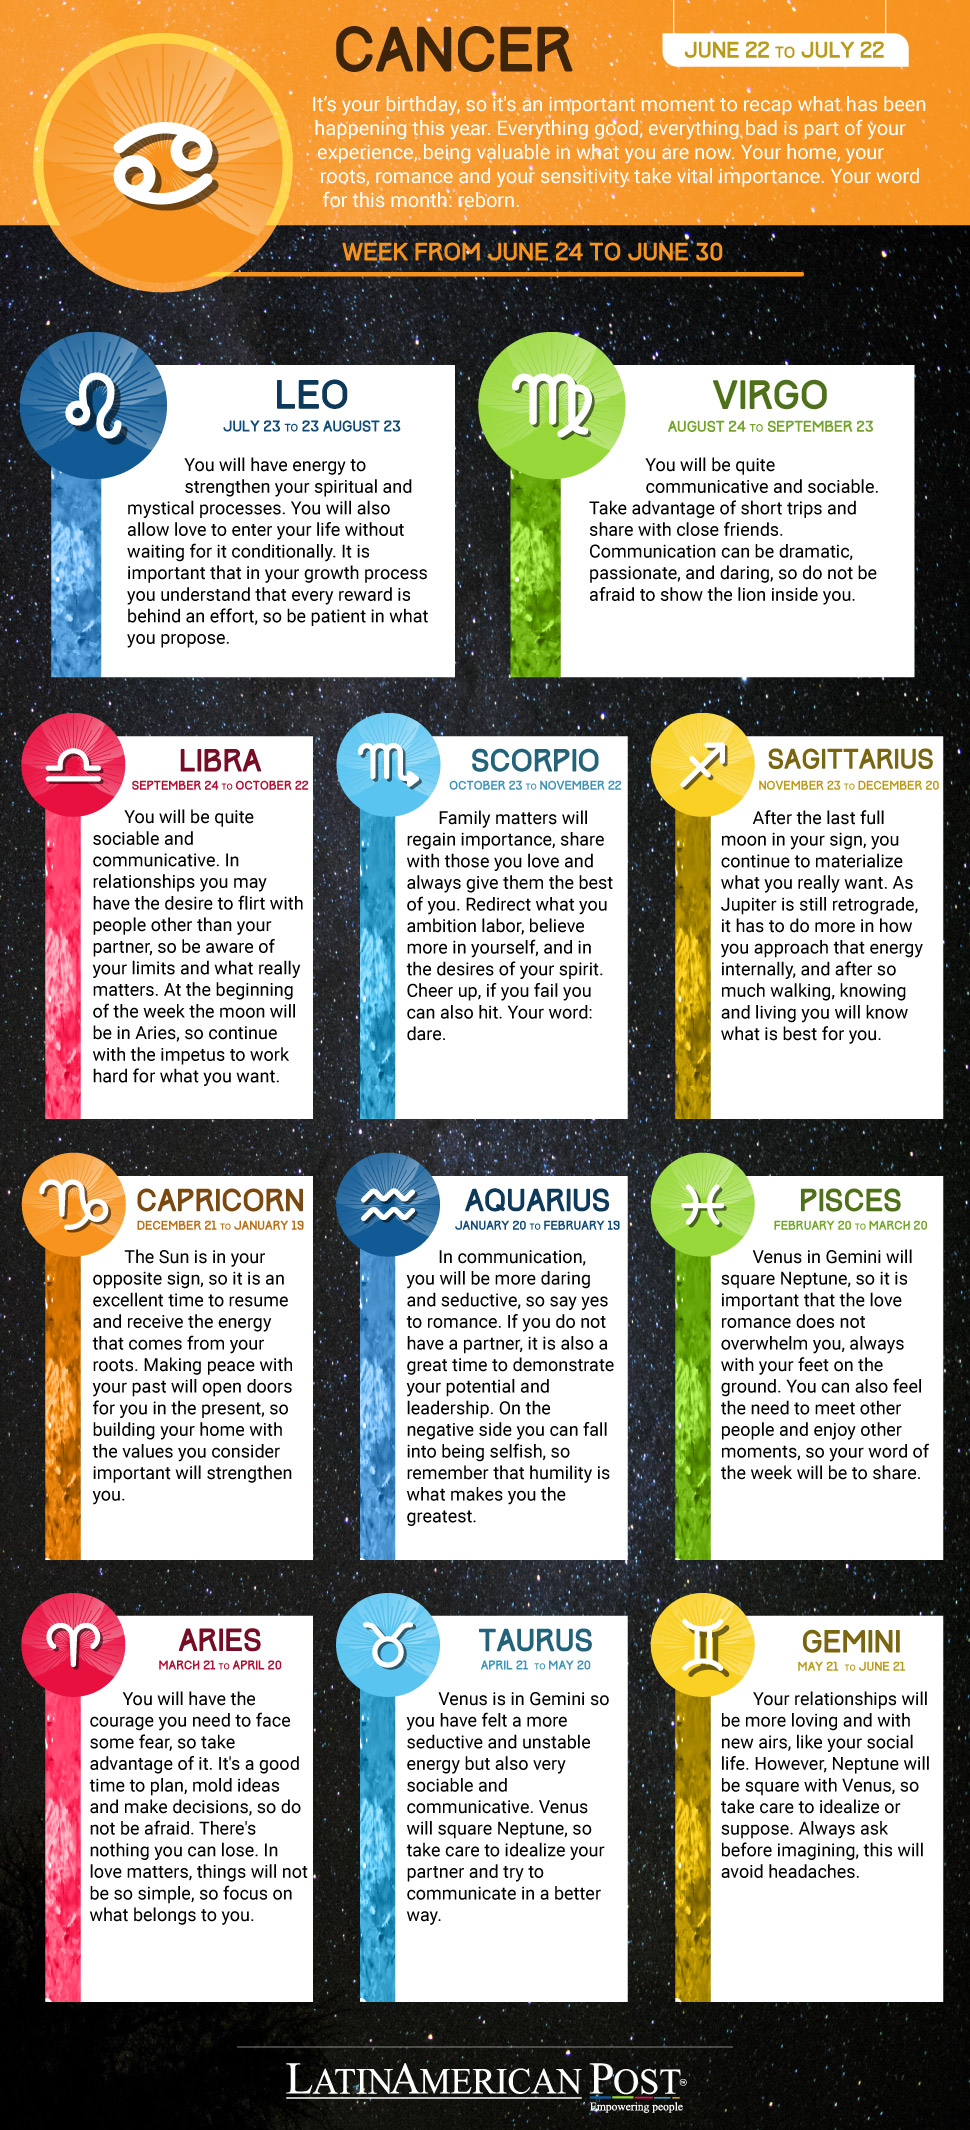 Latinamerican Post Horoscope